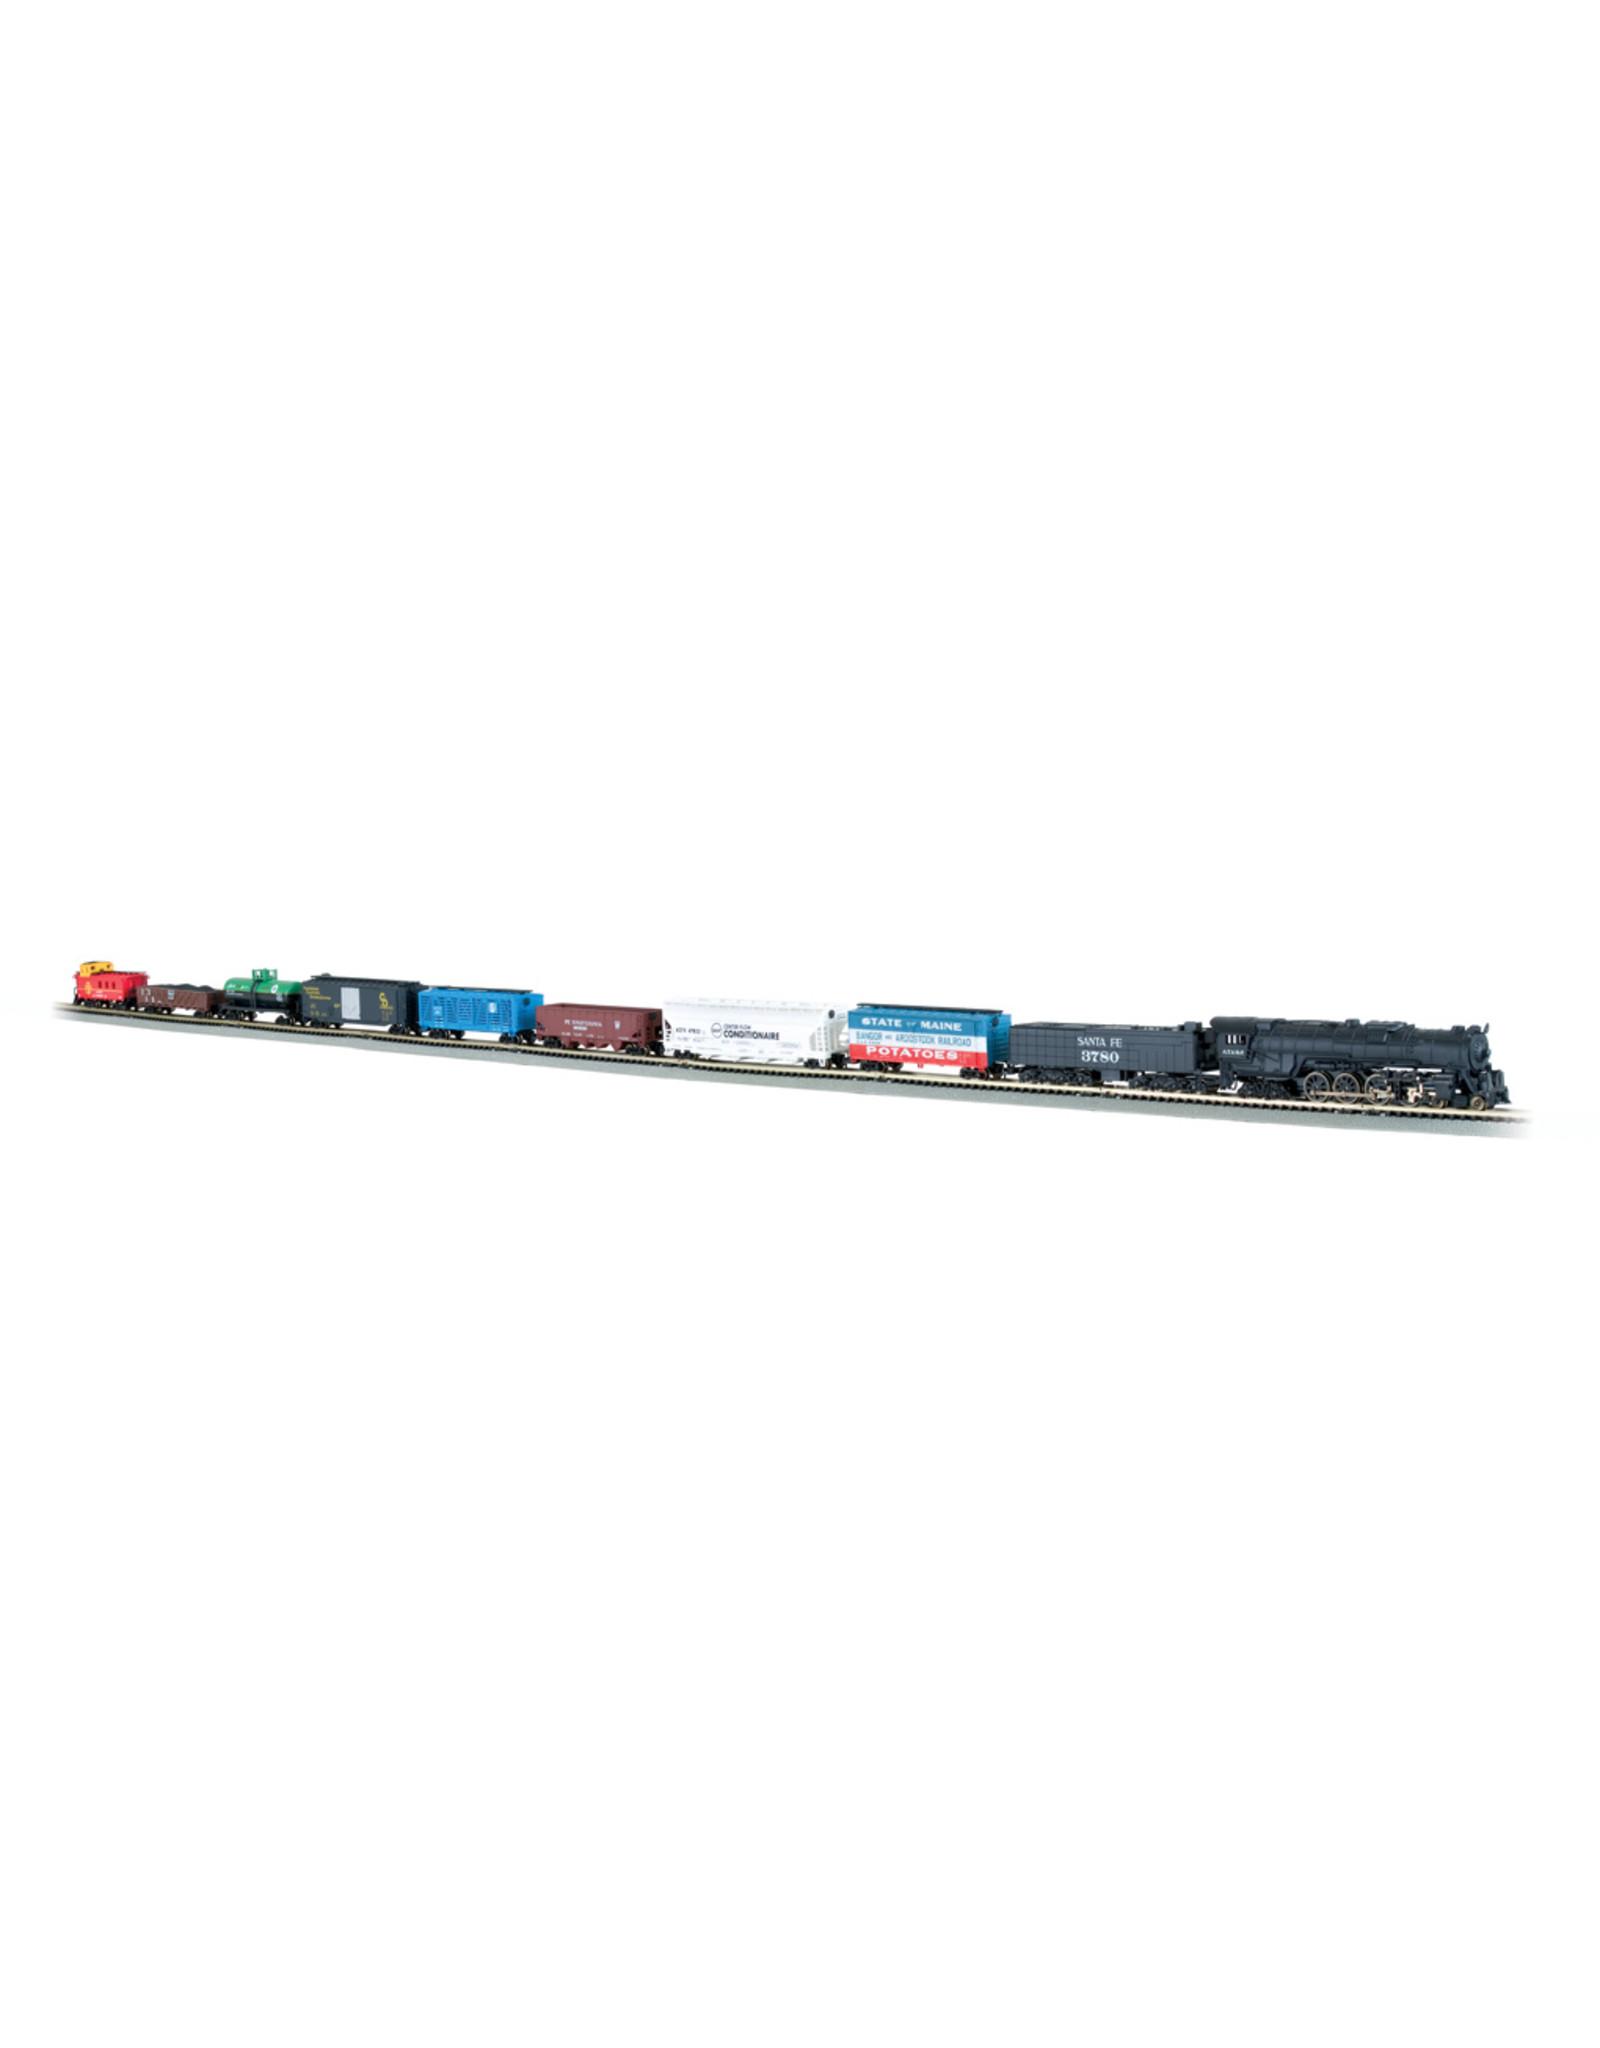 Bachmann Empire Builder RTR N Scale Train Set